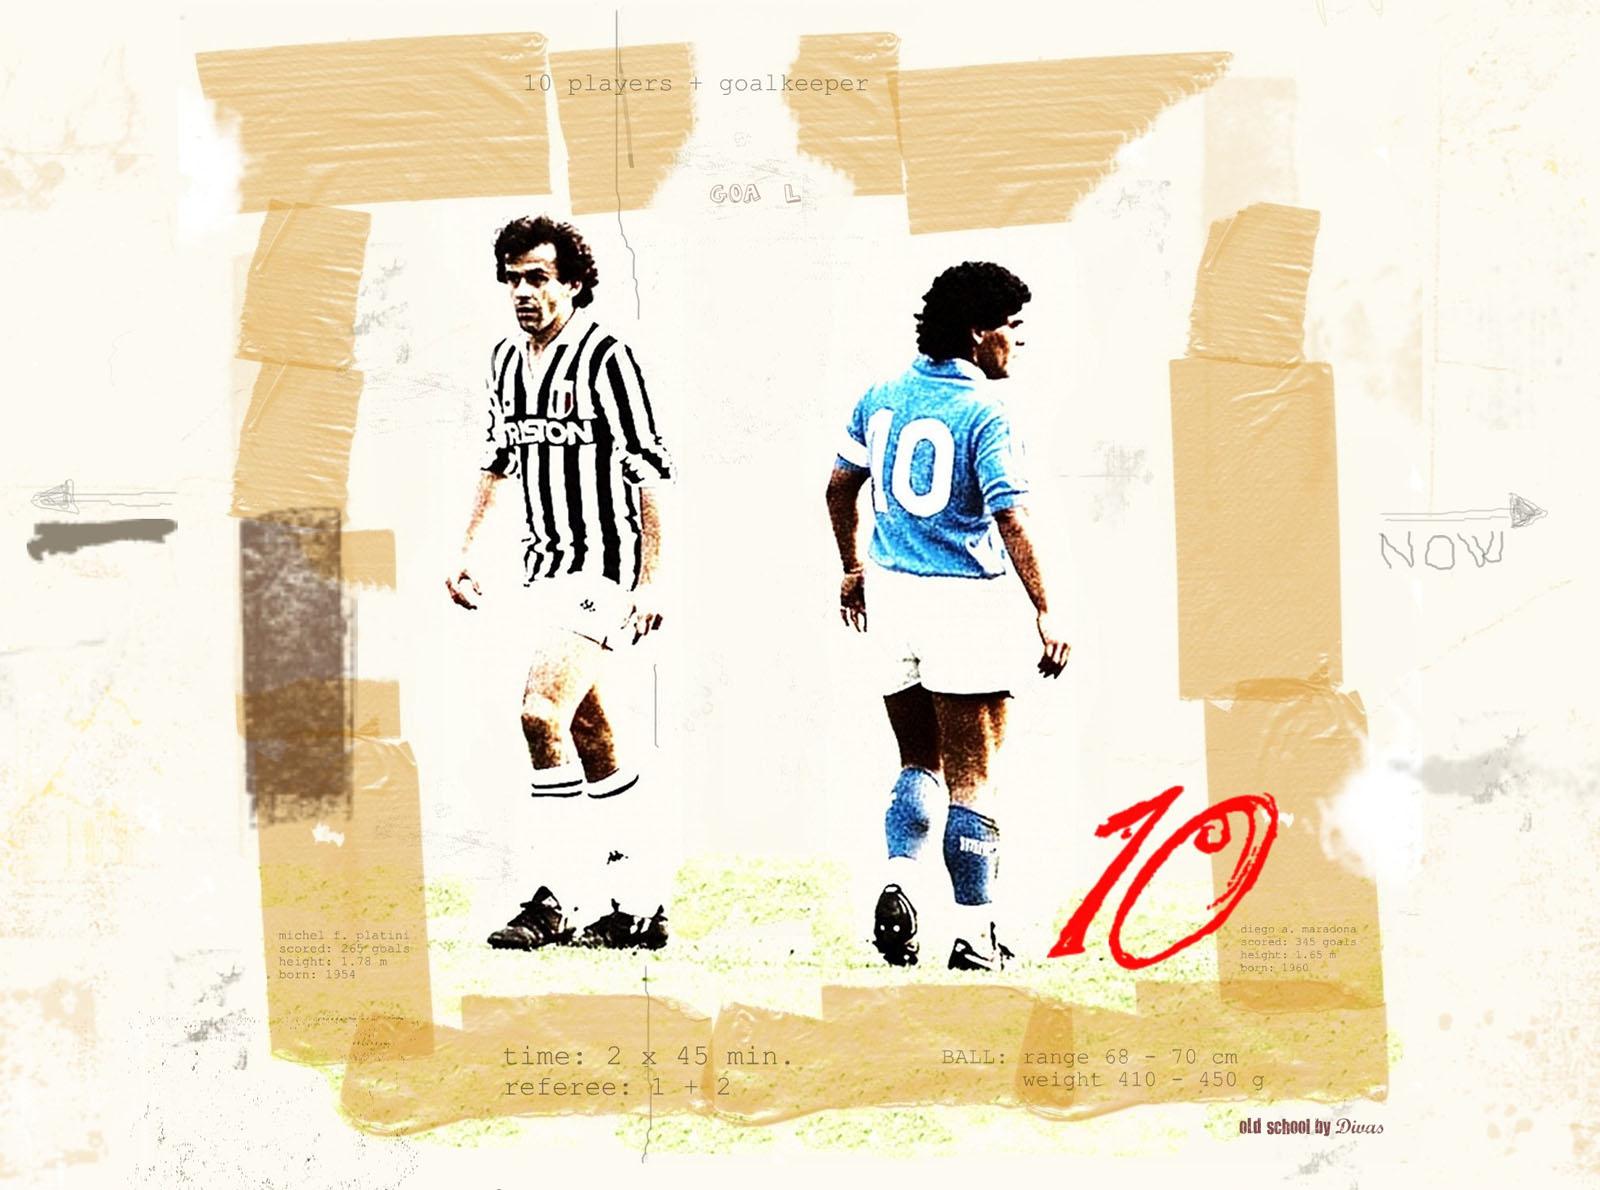 http://3.bp.blogspot.com/-83iOglNWrR8/TvCH1asHFbI/AAAAAAAAL0M/8p7yzDSryys/s1600/Diego+Maradona+and+Michel+Platini+by+Divas.jpg